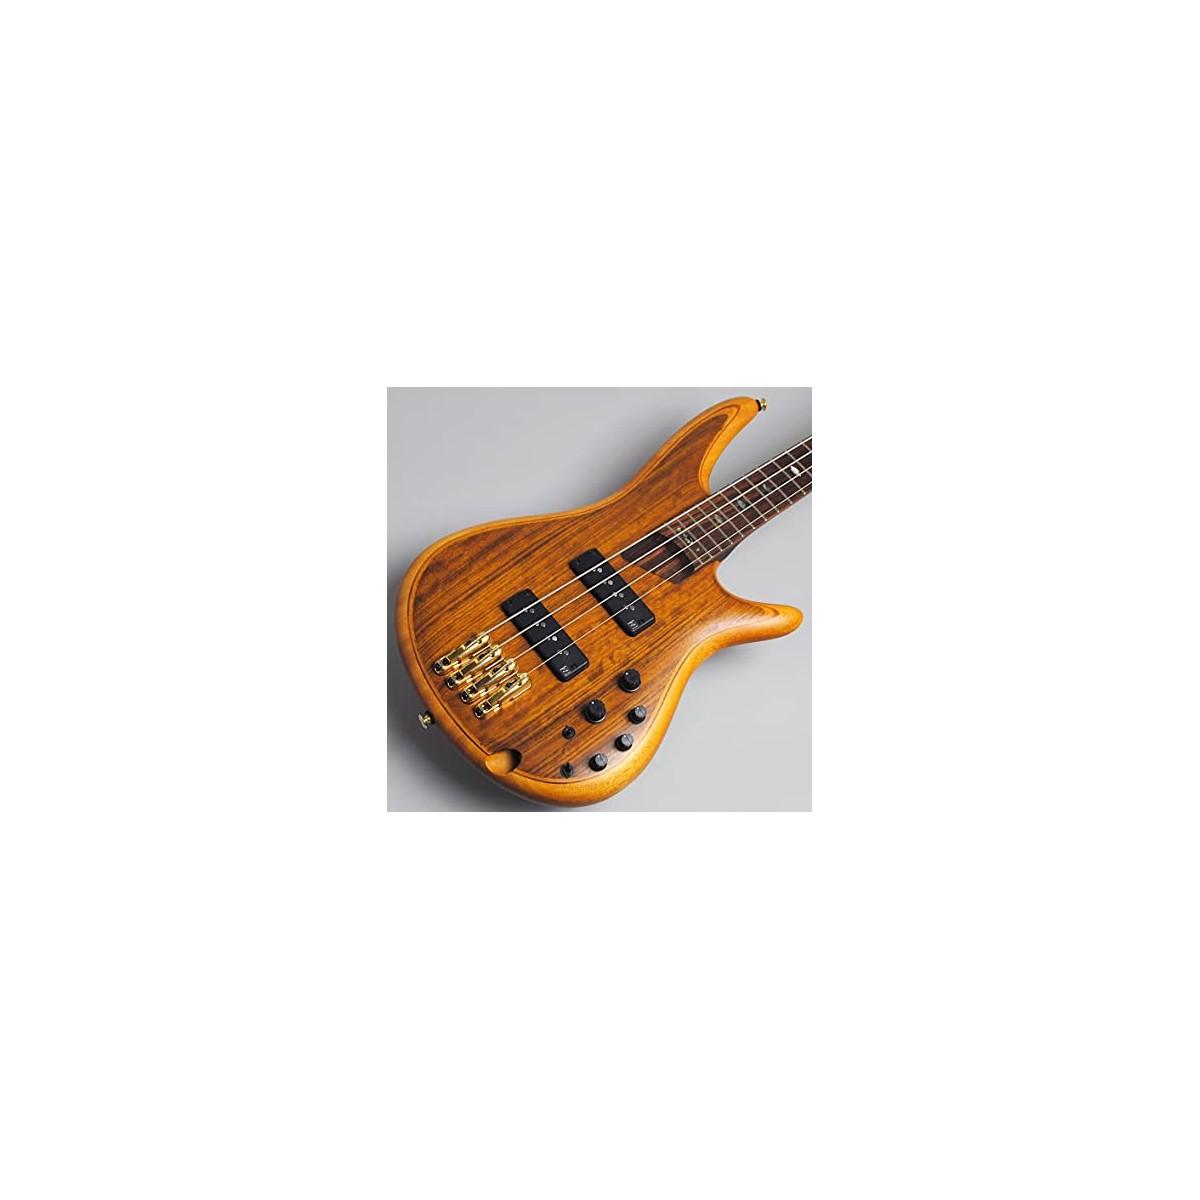 ELECTRO HARMONIX THE SILENCER NOISE GATE